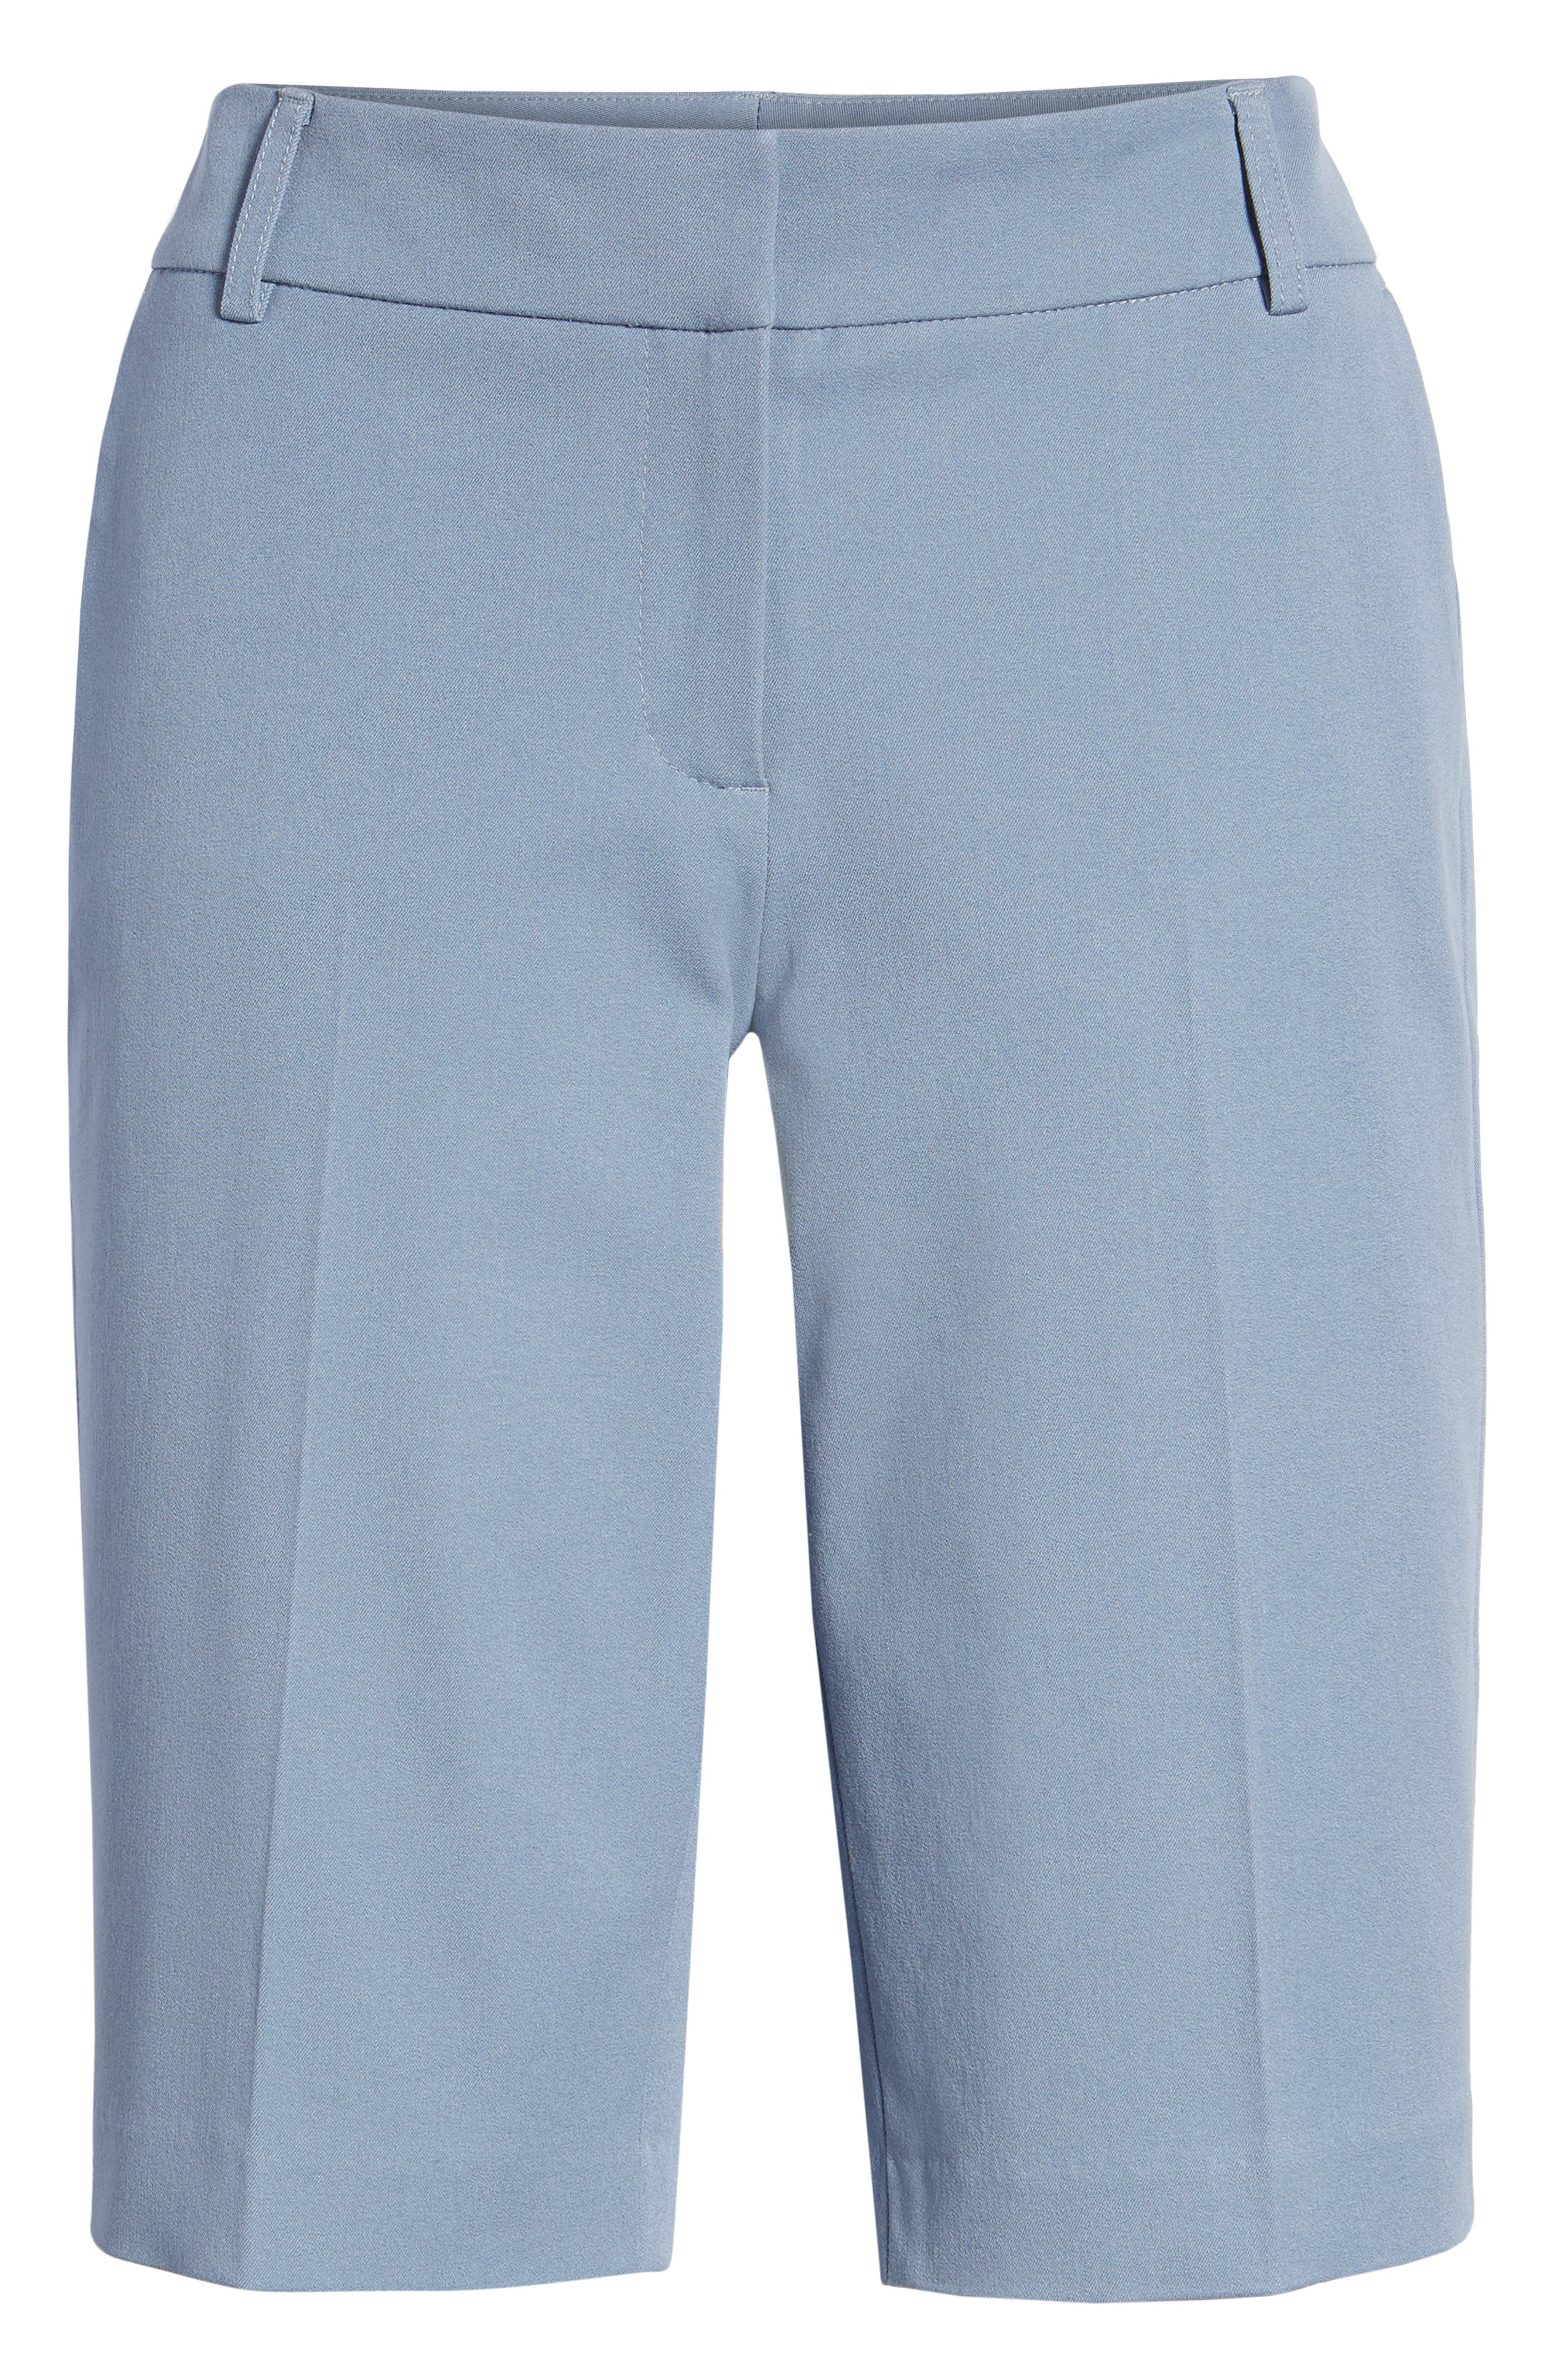 Stretch Bermuda Shorts,                             Alternate thumbnail 48, color,